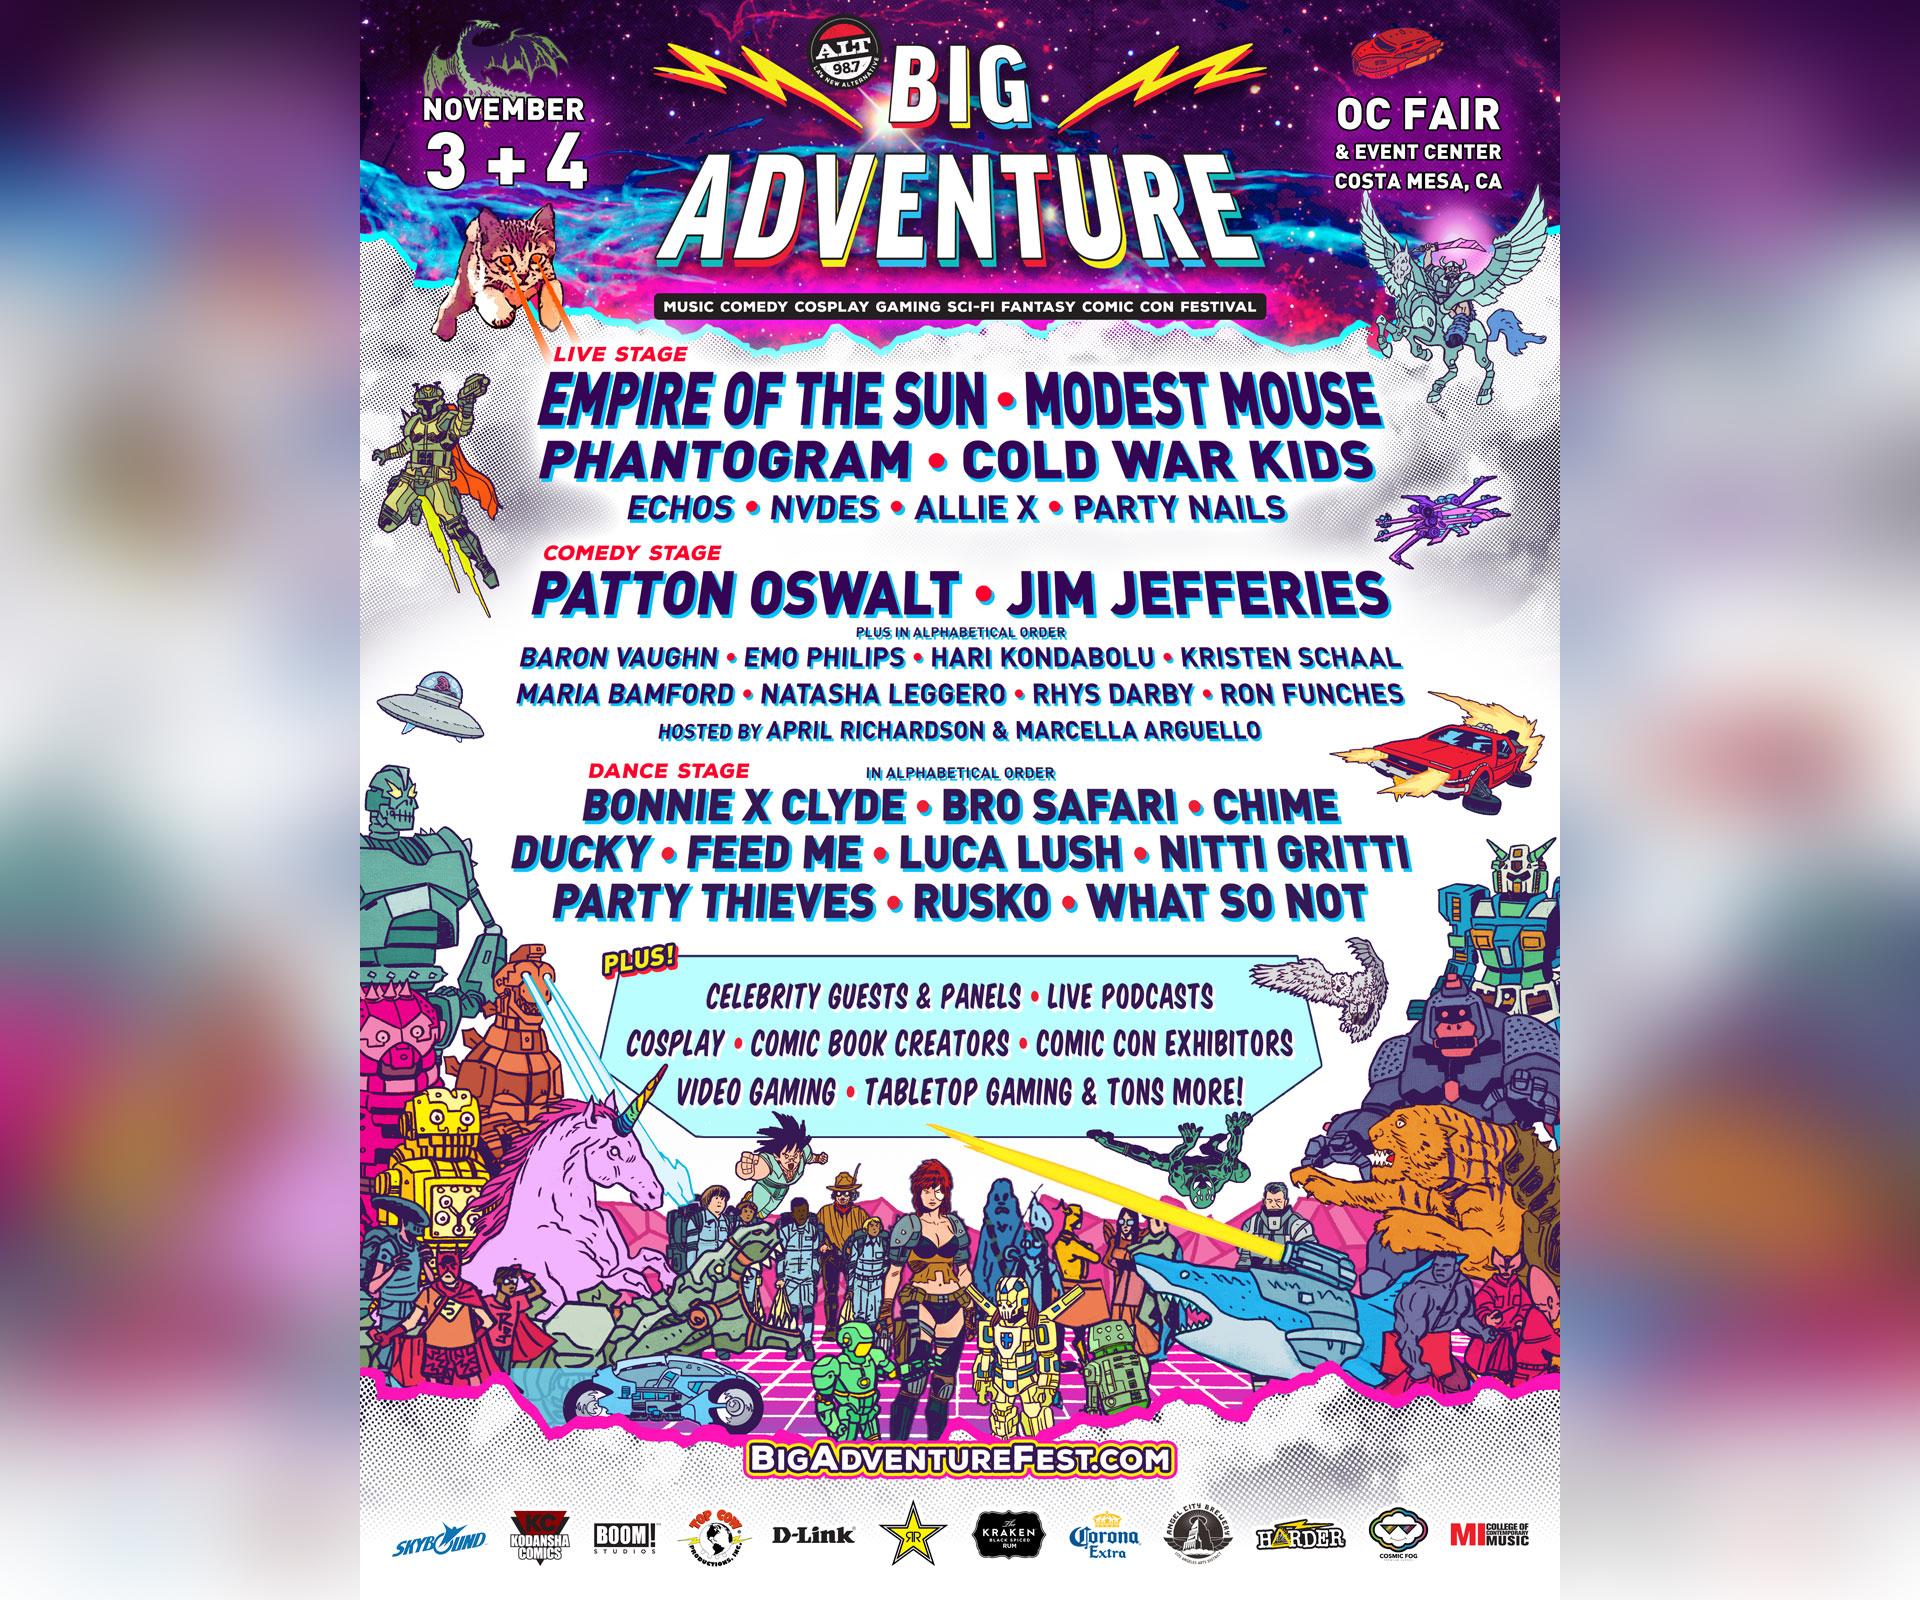 Festival lineup poster courtesy of Big Adventure Festival.